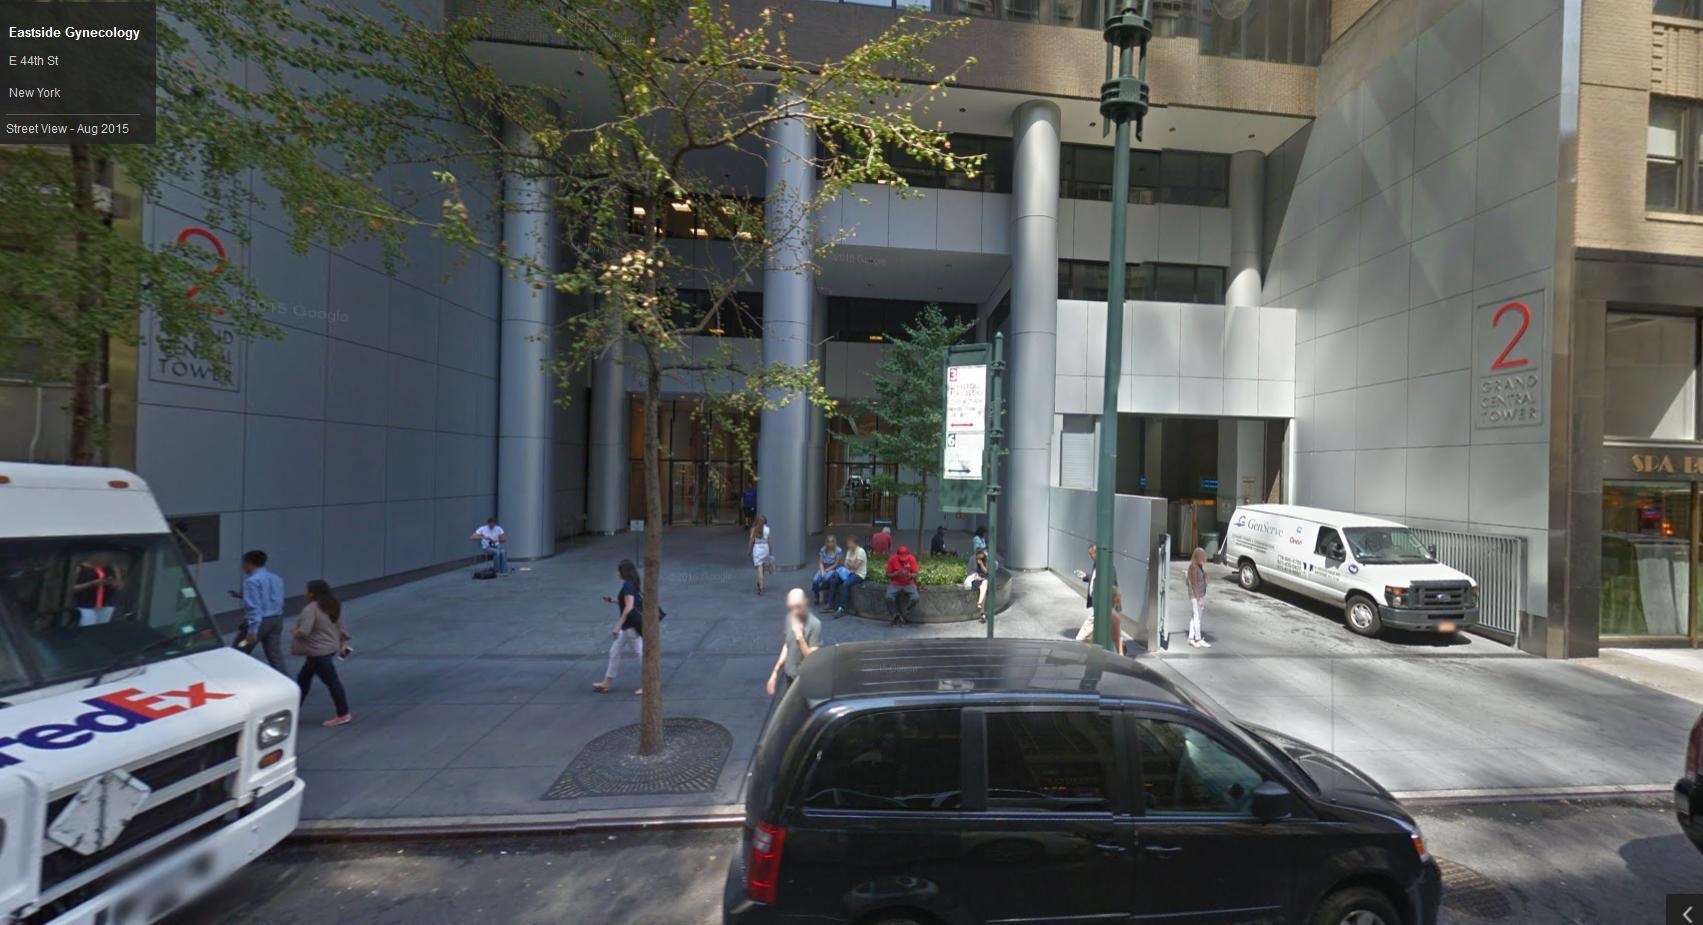 Eastside Gynecology - Google Maps 2